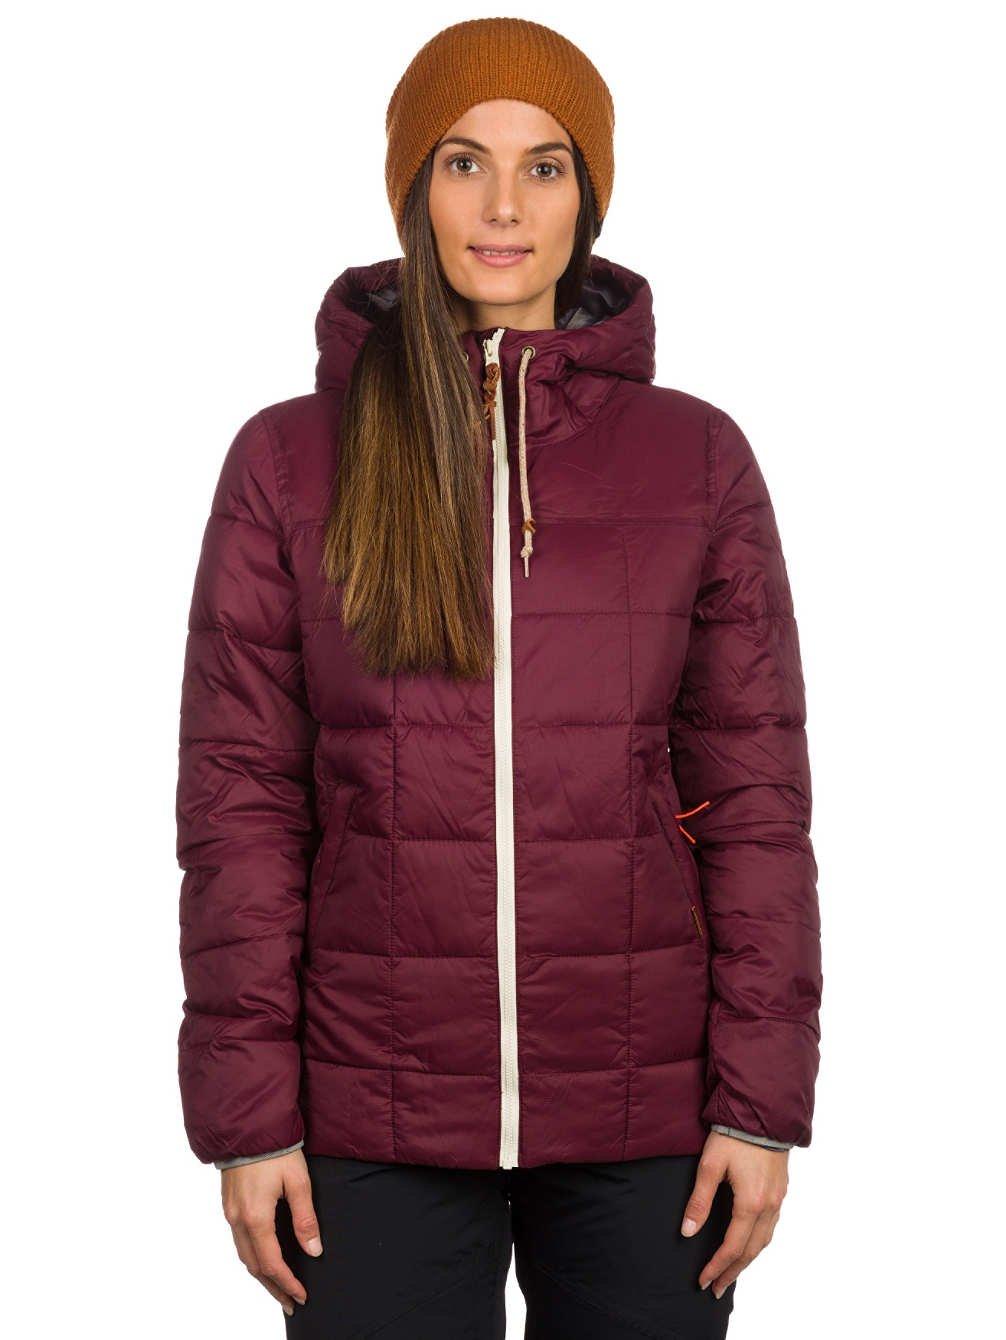 Damen Snowboard Jacke Holden Cumulus Jacket